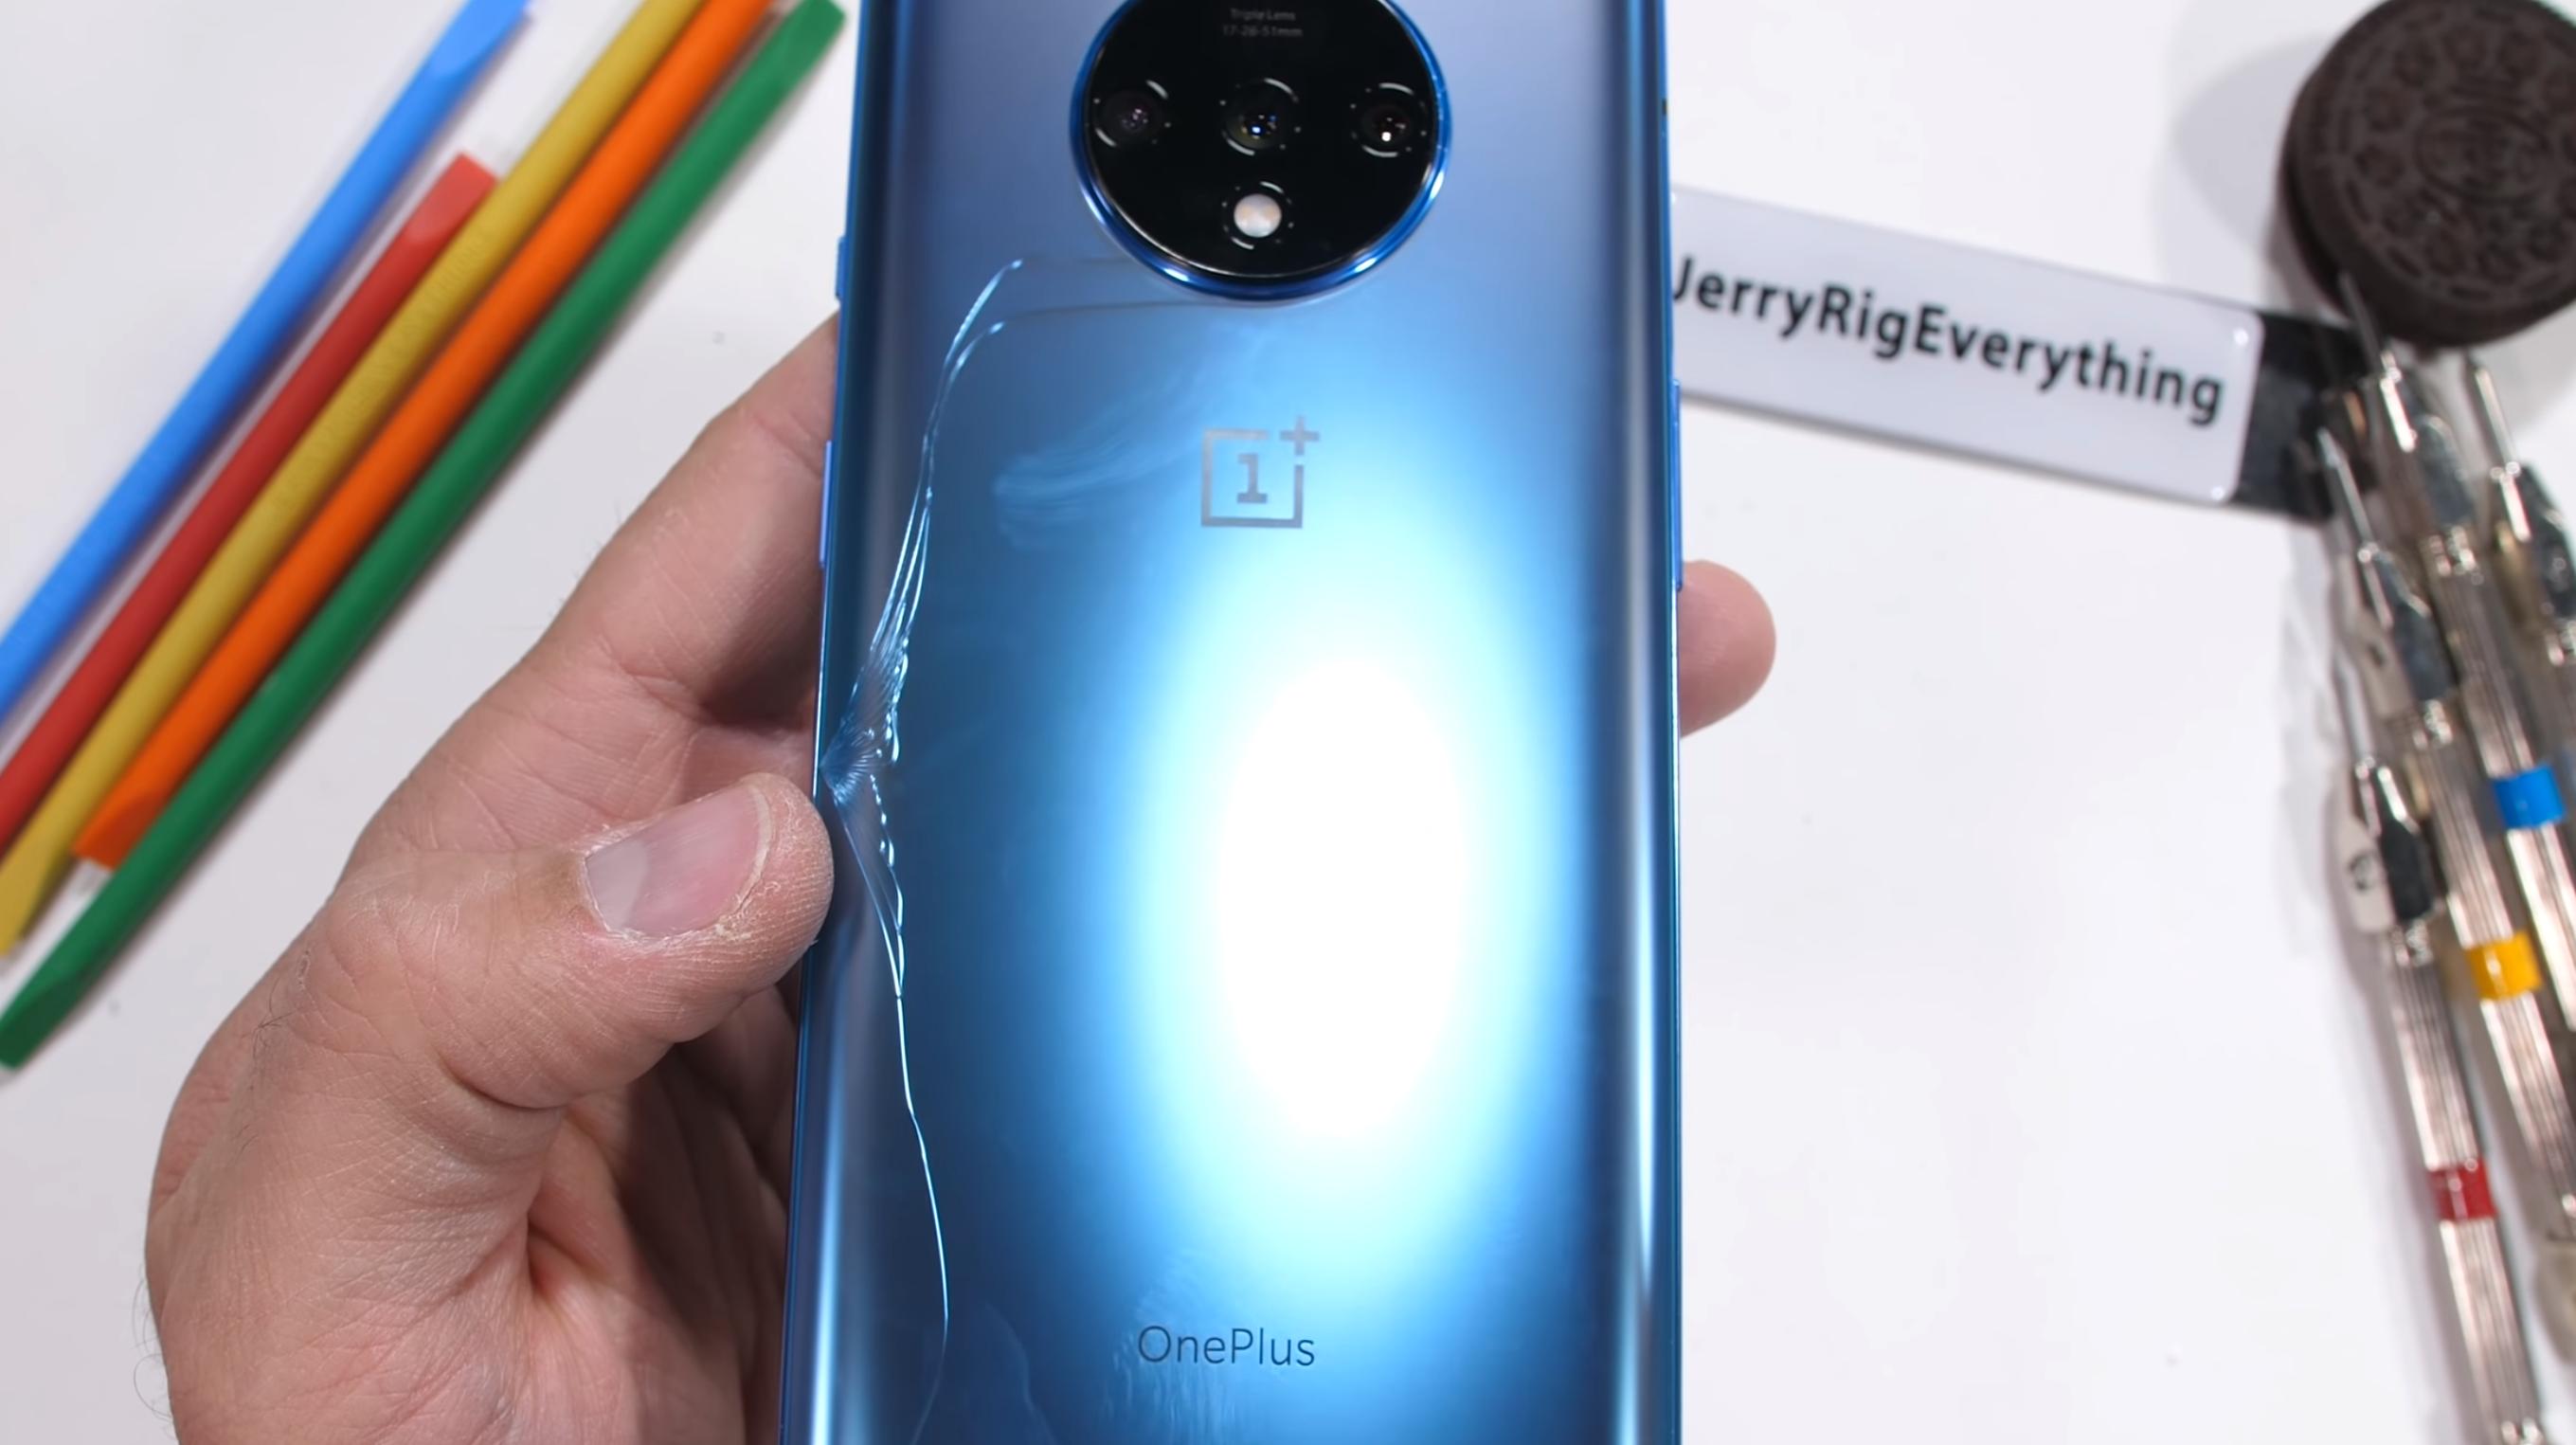 OnePlus 7T cracks under the pressure of JerryRigEverything's durability test